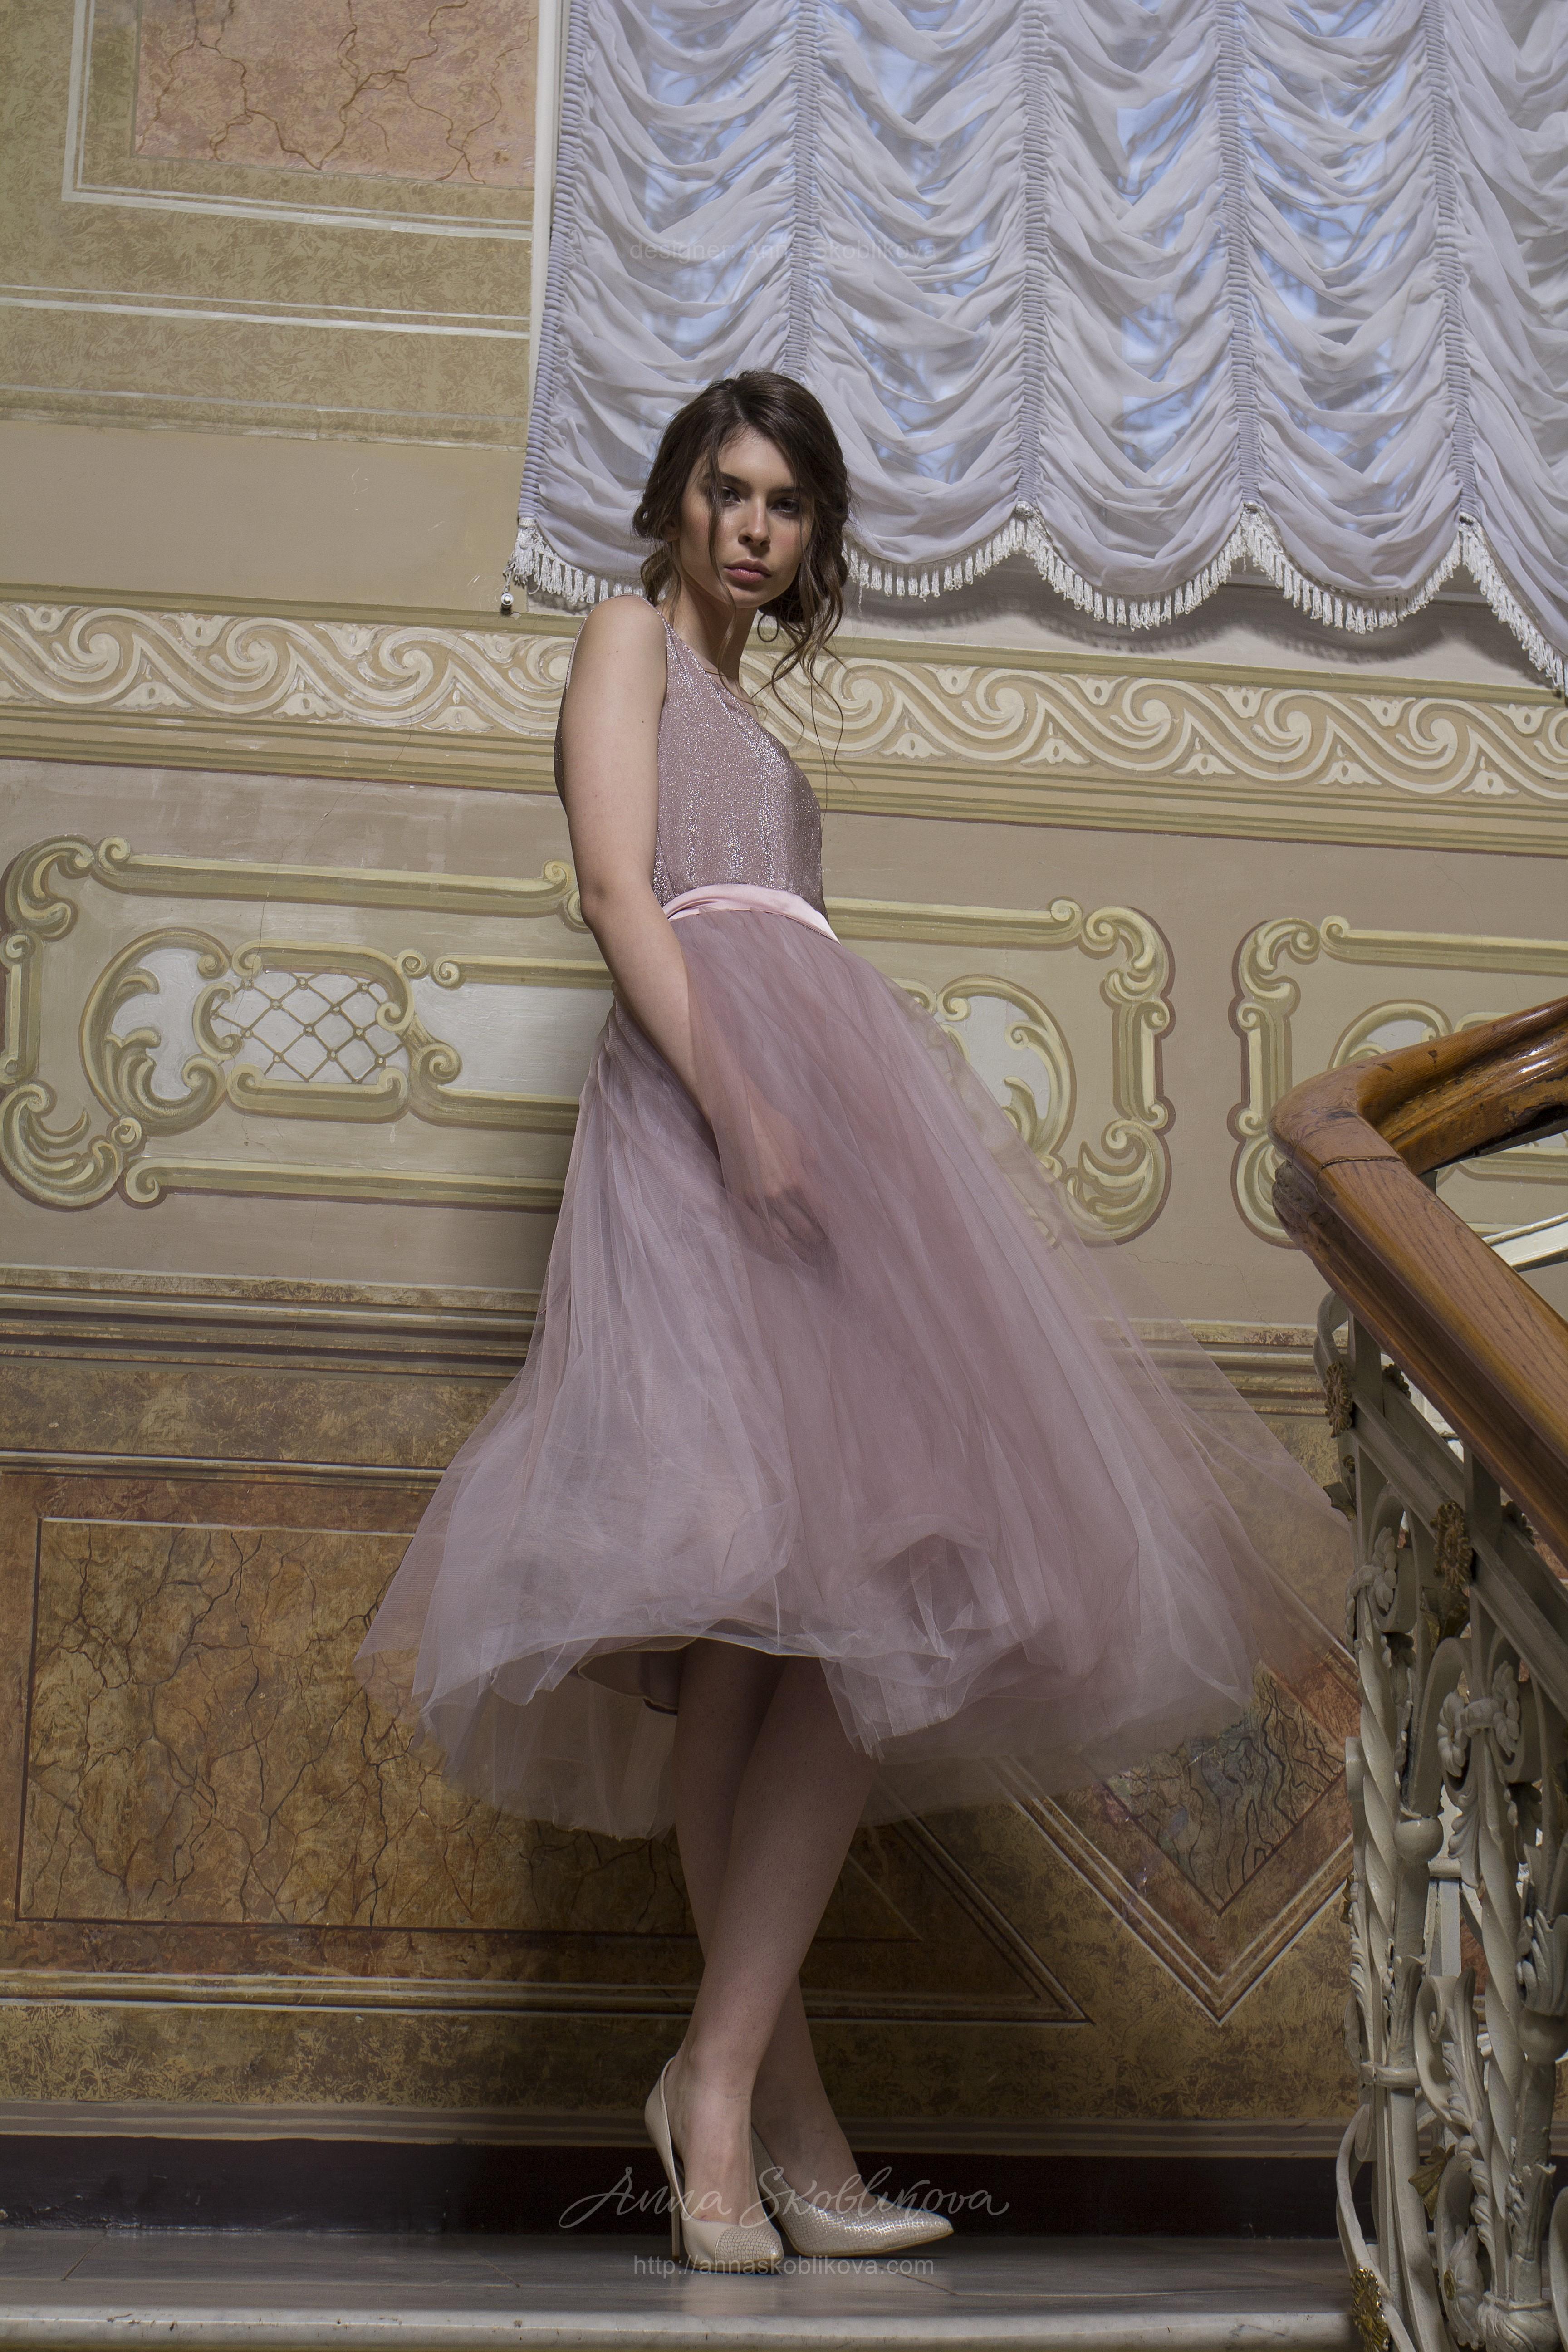 4abb47ce590 Elza - Зефирный образ платья с ноткой элегантности   Anna Skoblikova